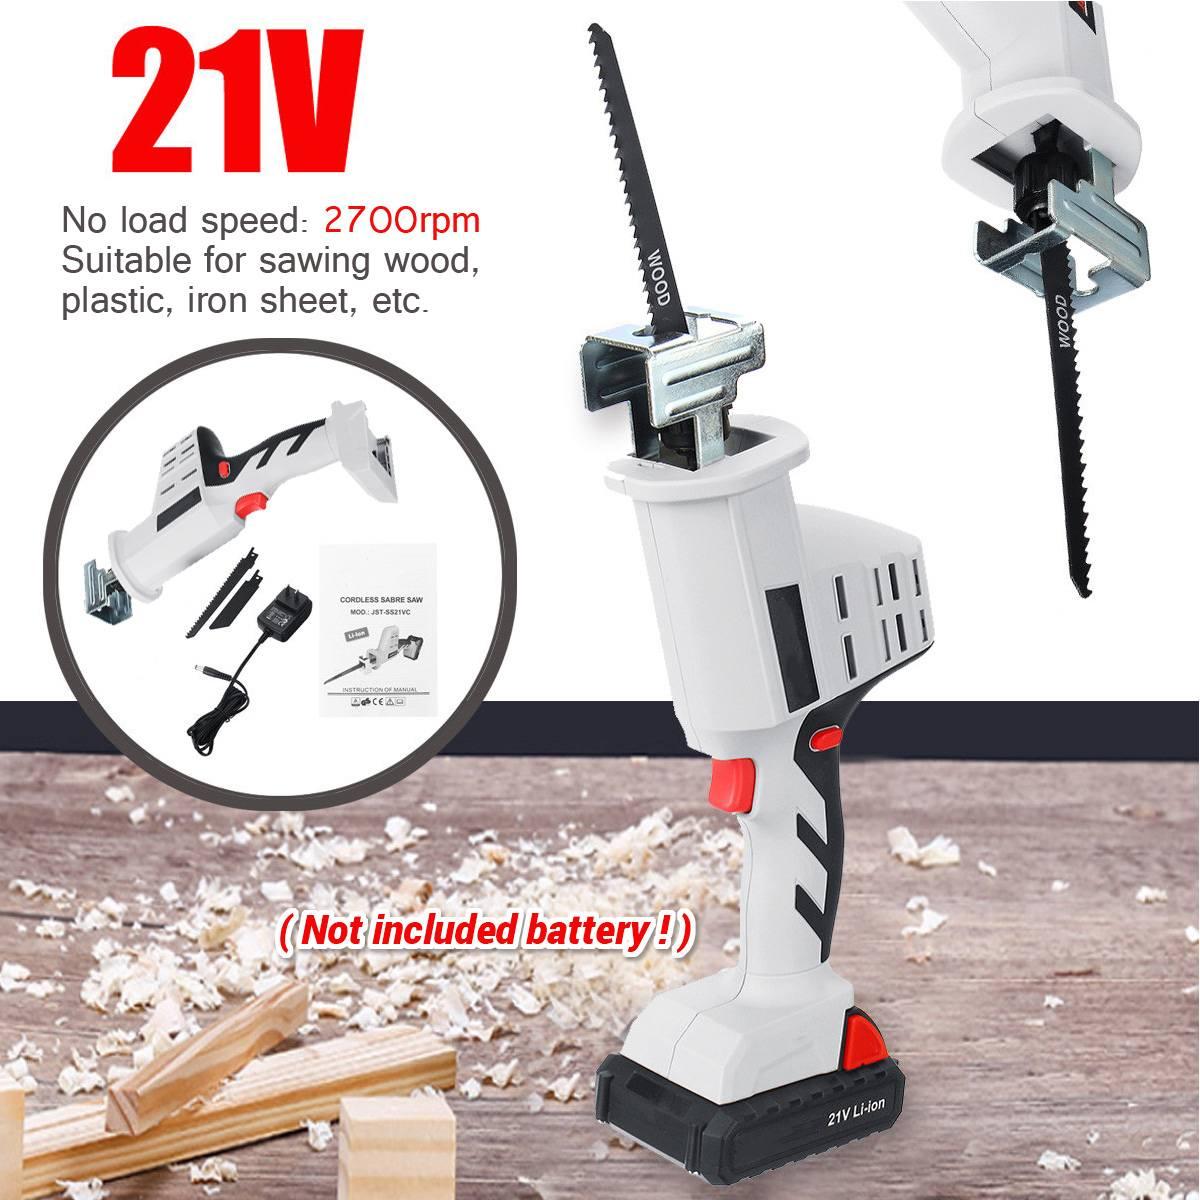 21V Portable Charging Cordless Electric Saw 1500/2000/4000mAh Li Ion Reciprocating Saws with 1500mAh Li Ion Battery